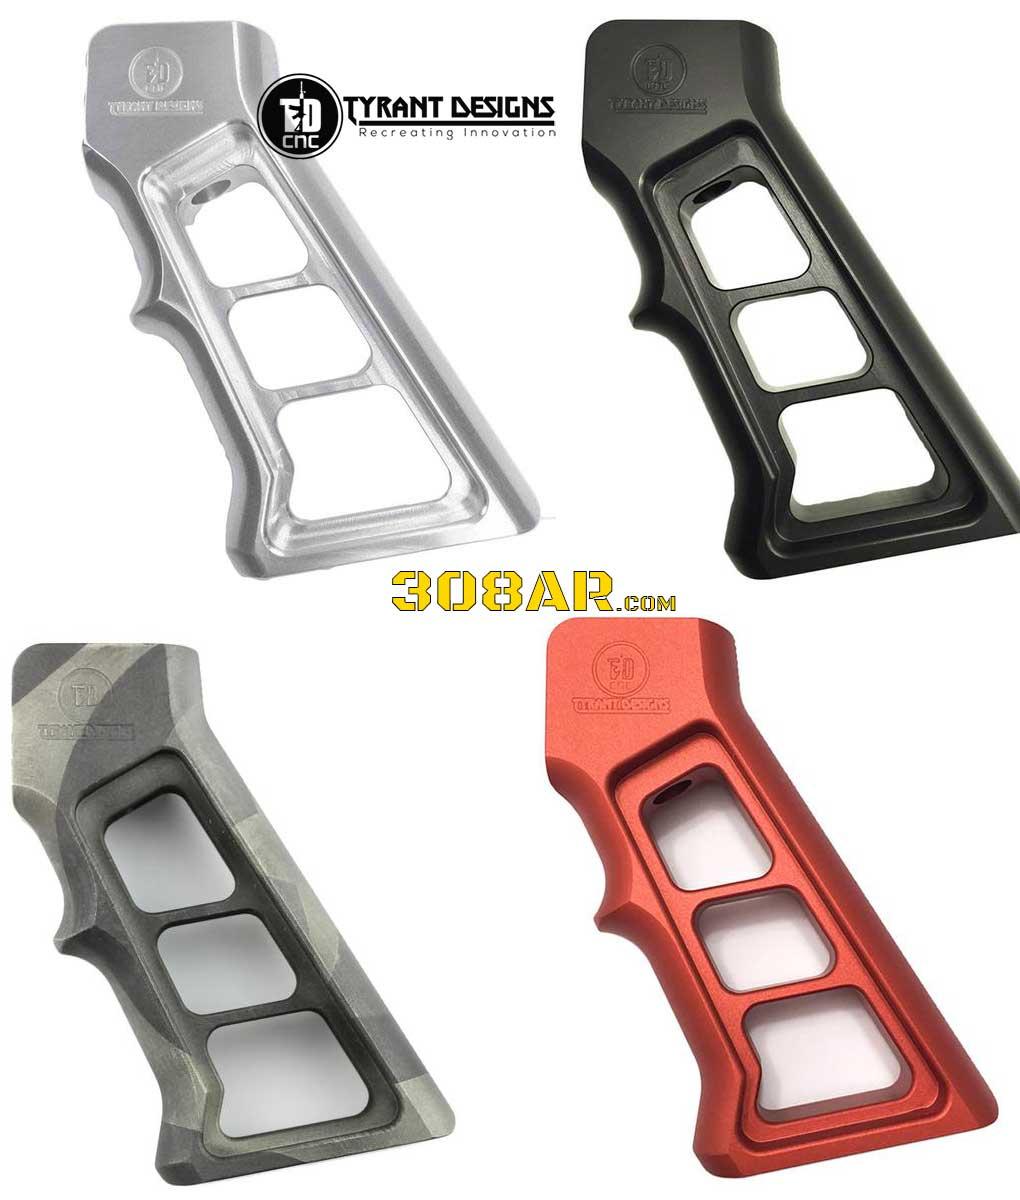 Tyrant Designs Titan Grip